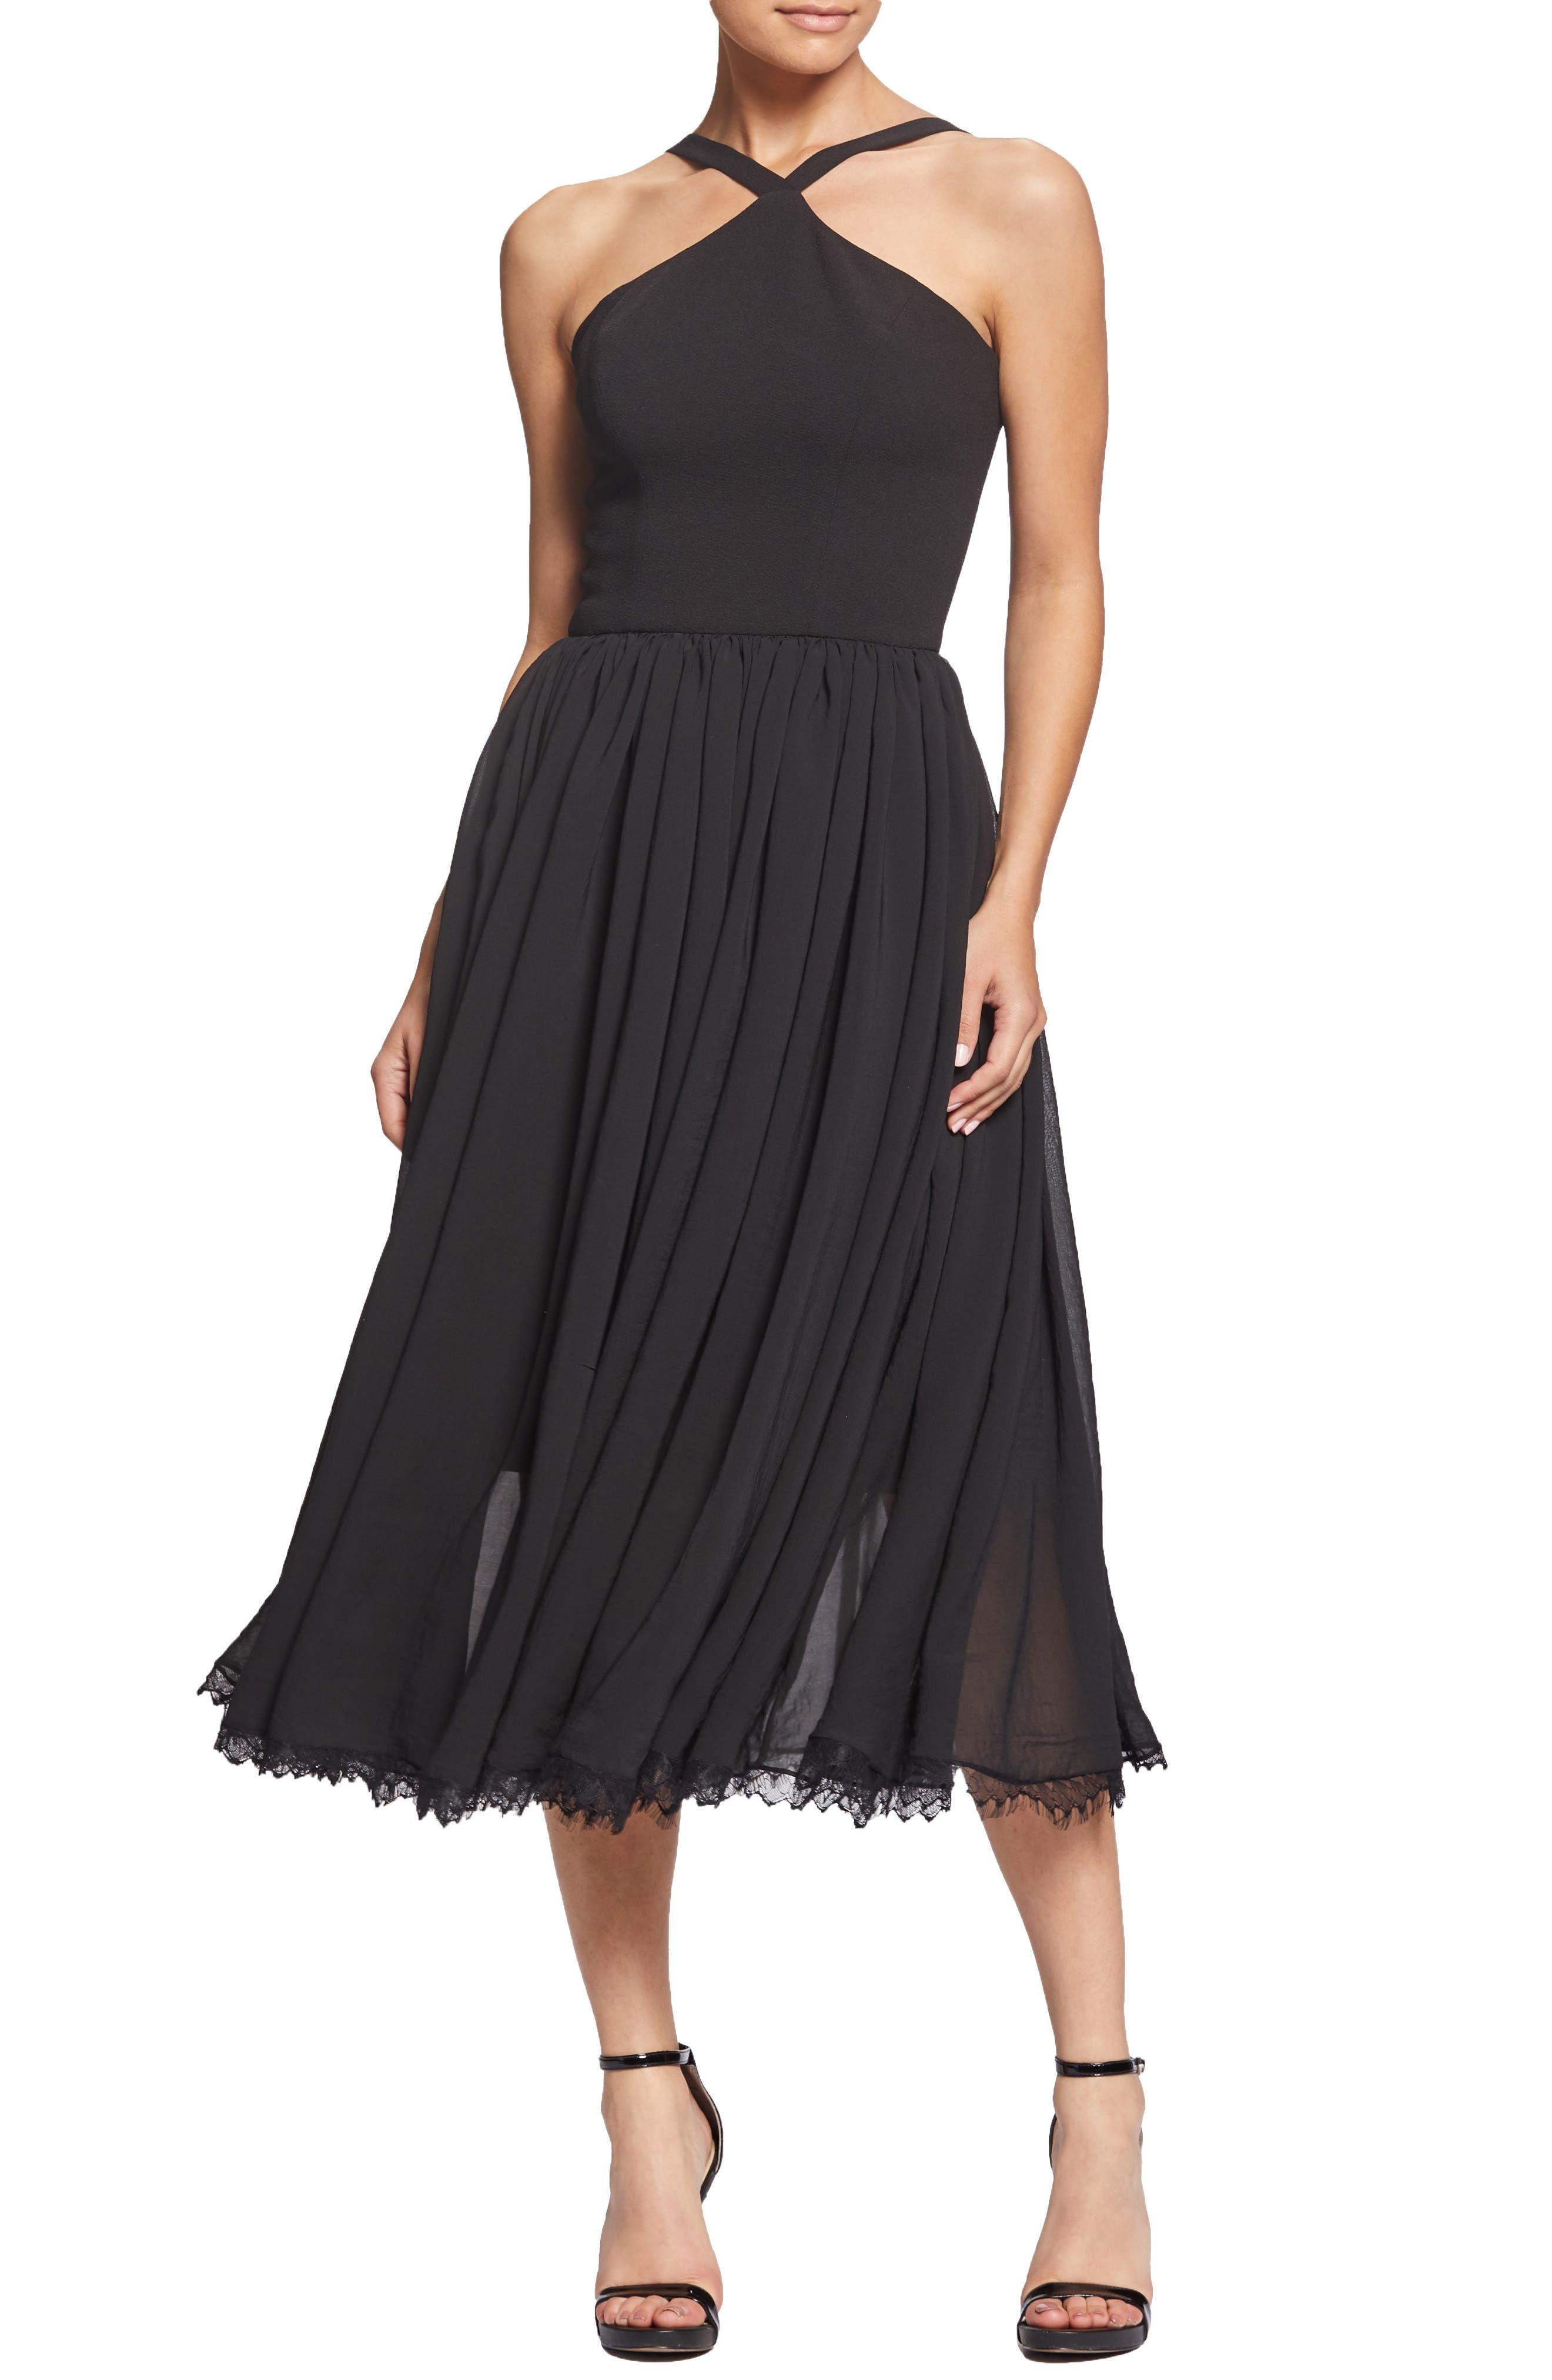 Dress The Population Dakota Crepe Chiffon Cocktail Dress, Black